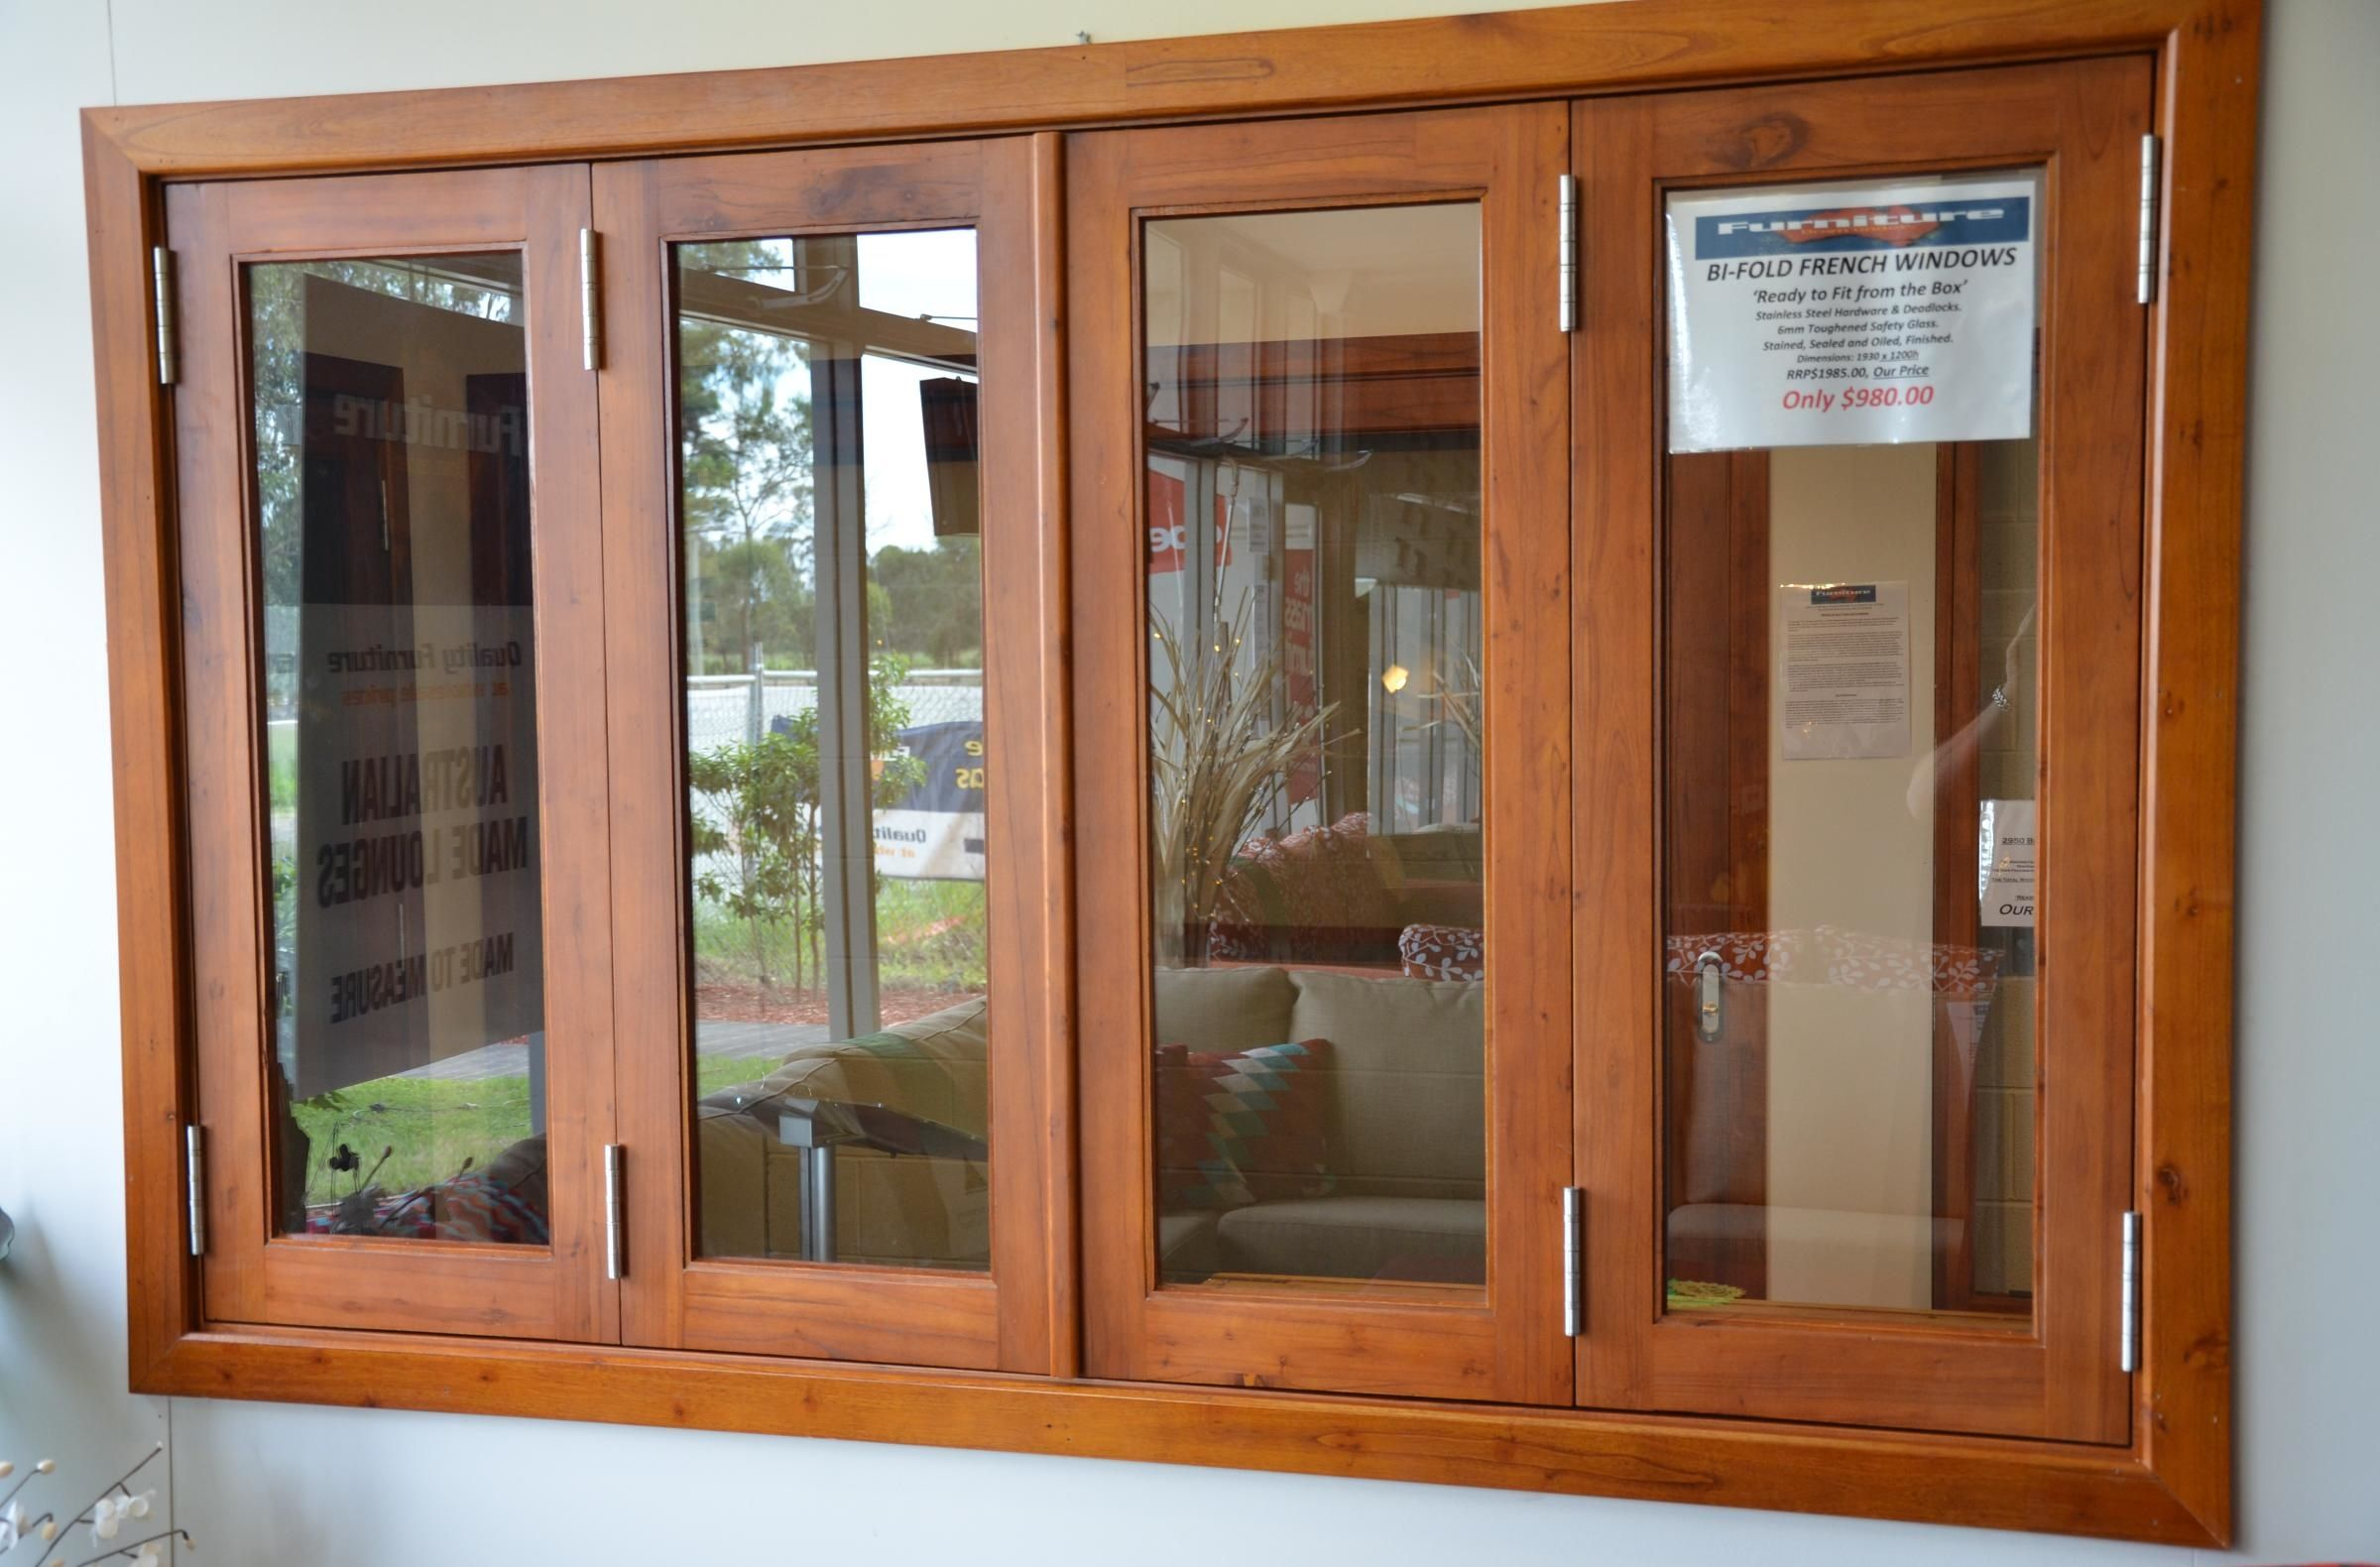 Solid Cedar Windows Simply Doors Windows Wooden Window Frames Wooden Window Design House Window Design